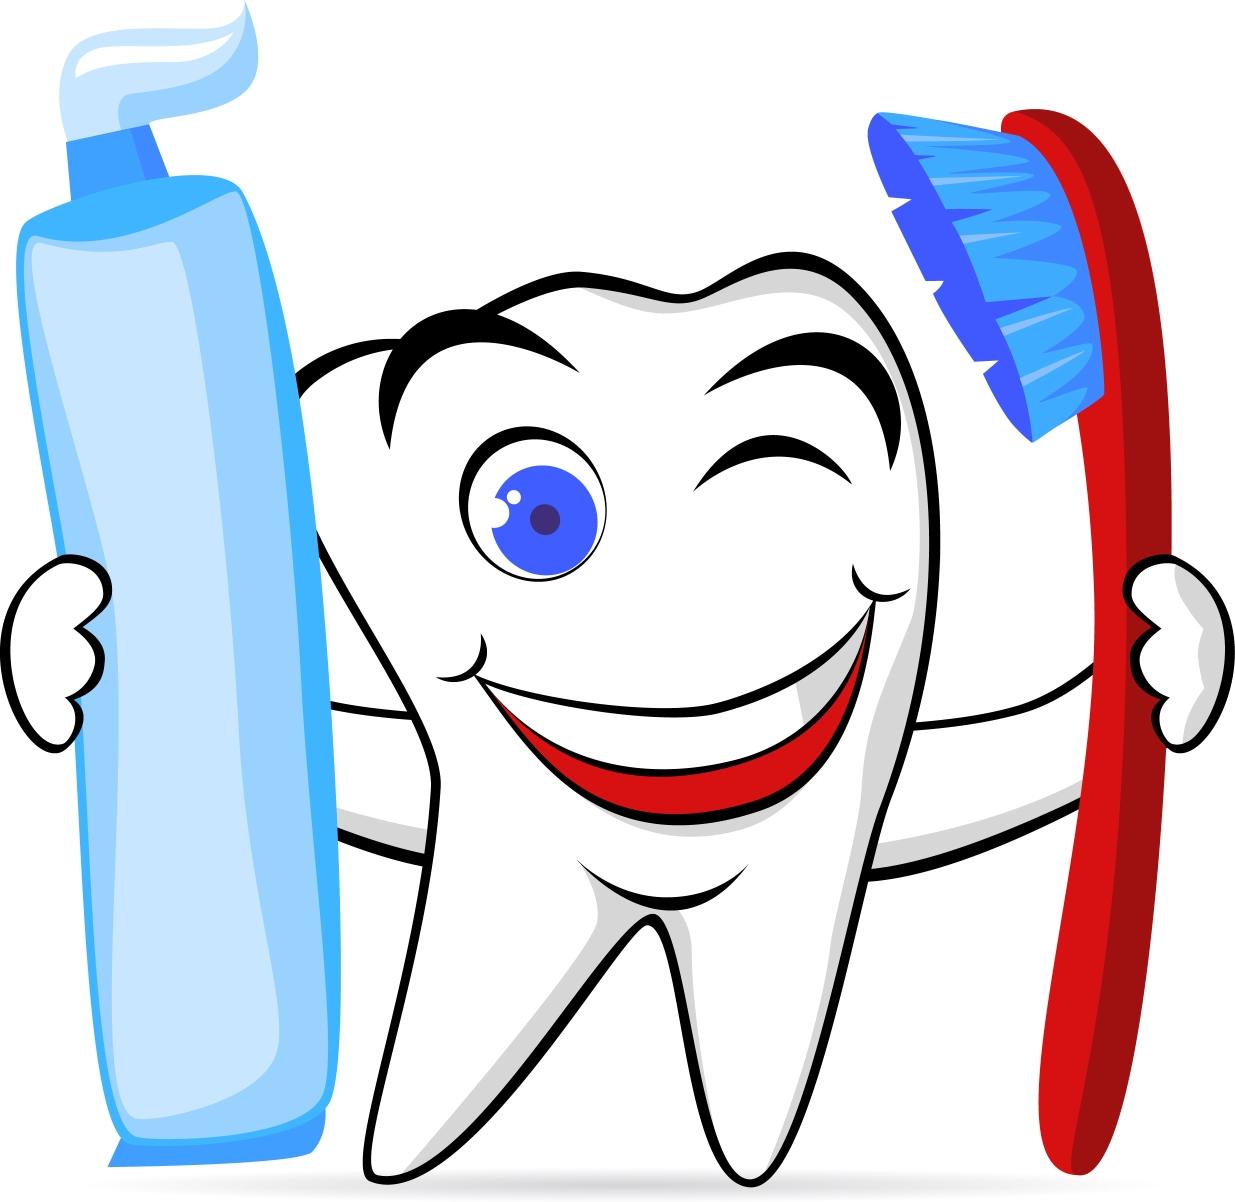 1235x1202 Dental Insurance Clipart Image